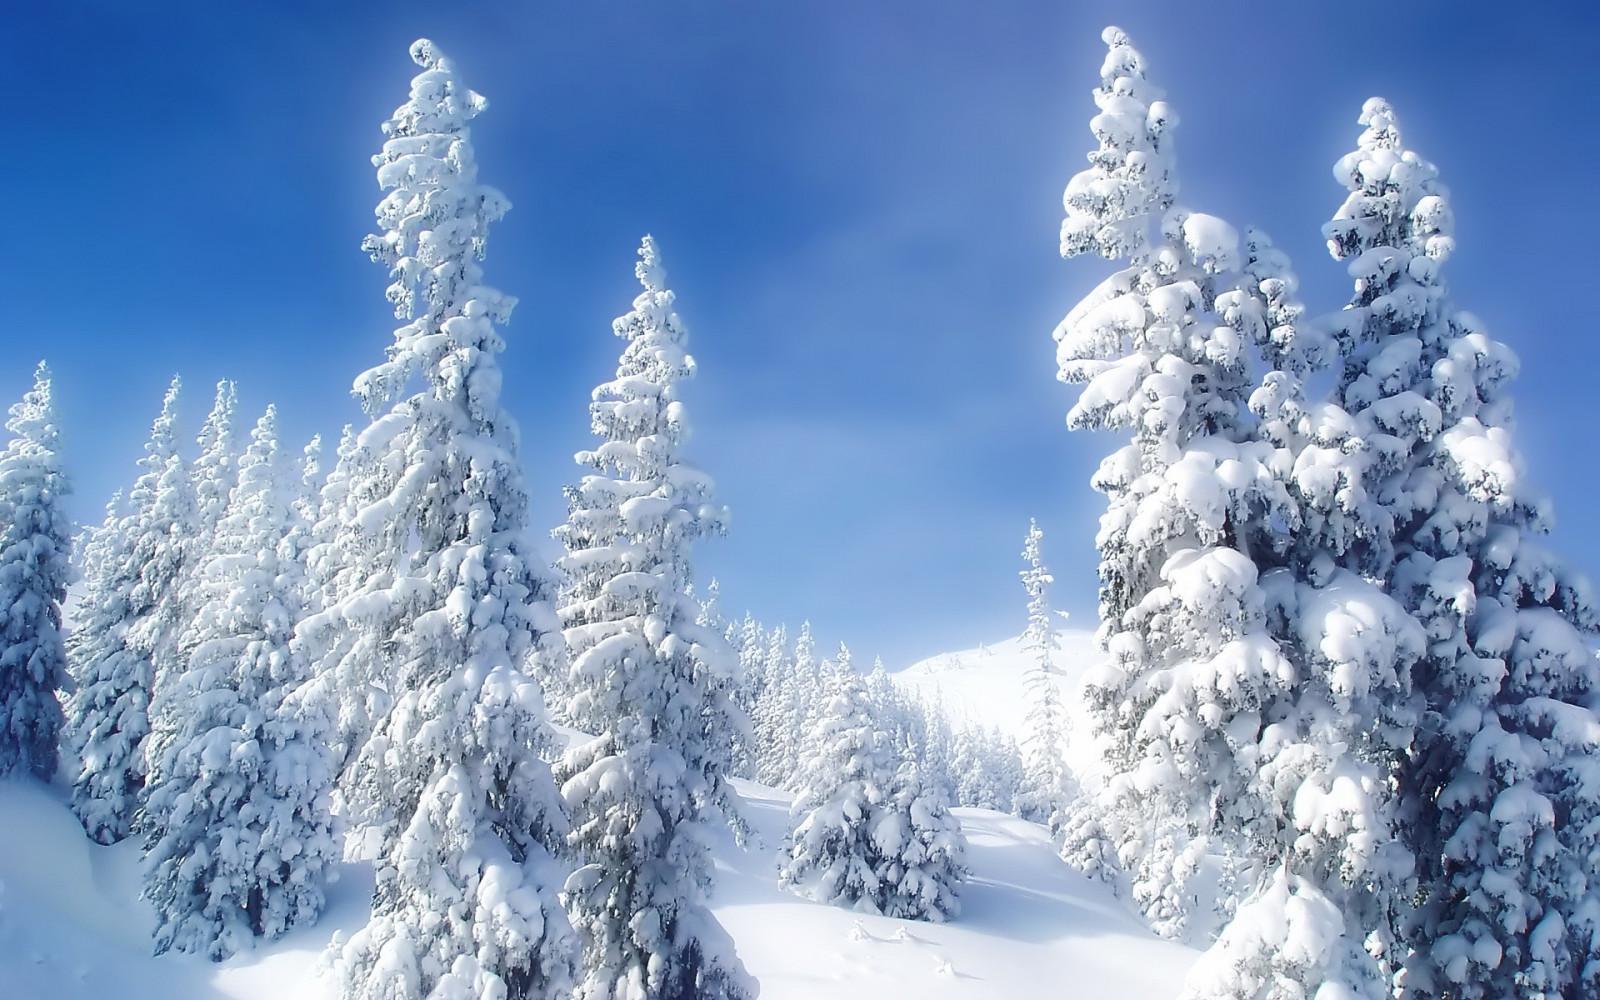 fond d 39 cran paysage for t la nature neige hiver branche gel pic a sapin gel arbre. Black Bedroom Furniture Sets. Home Design Ideas